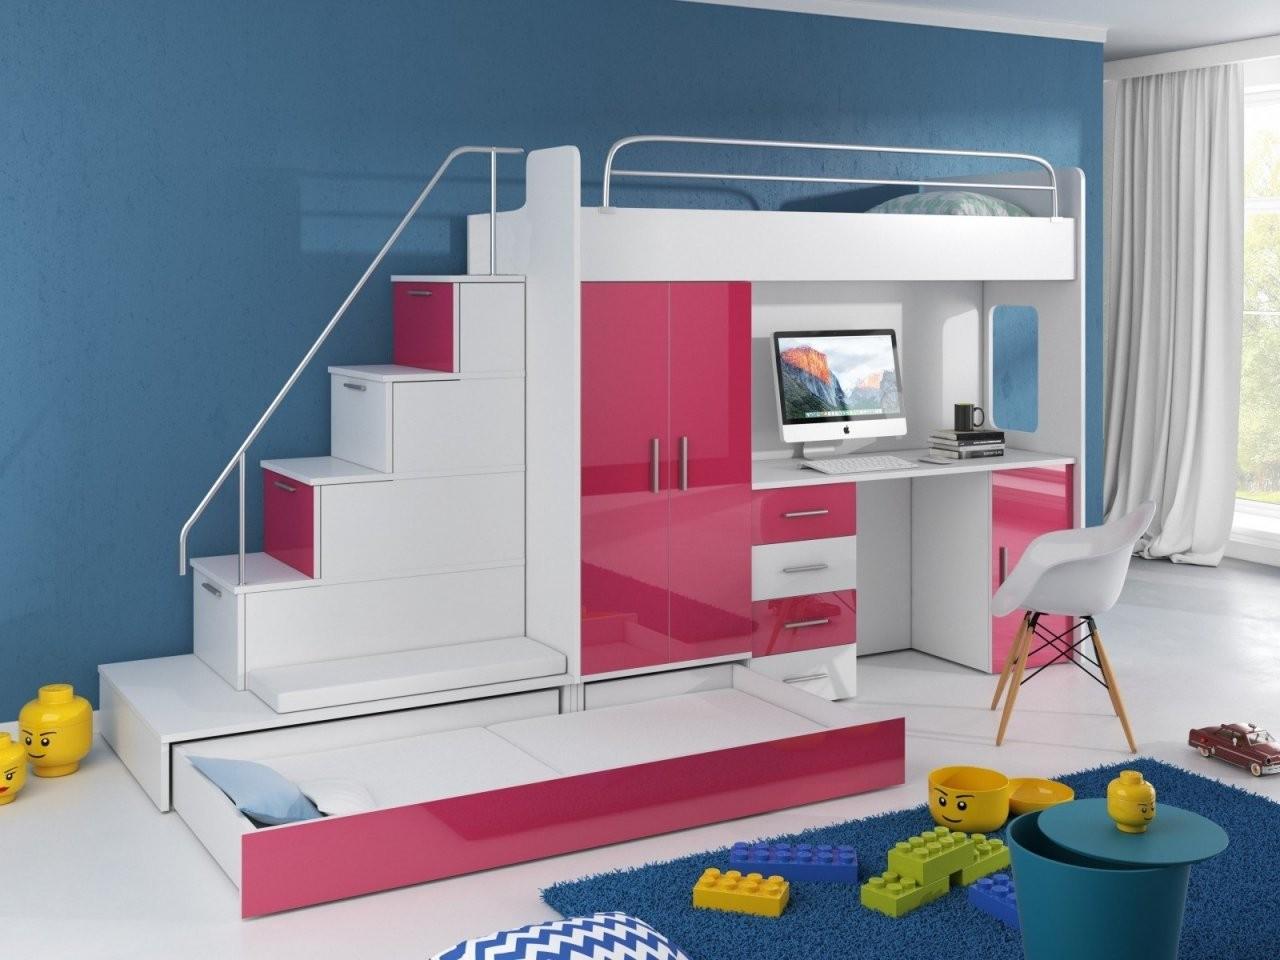 Jungen Schlafzimmer Komplett | Maritime Kinderzimmer Deko